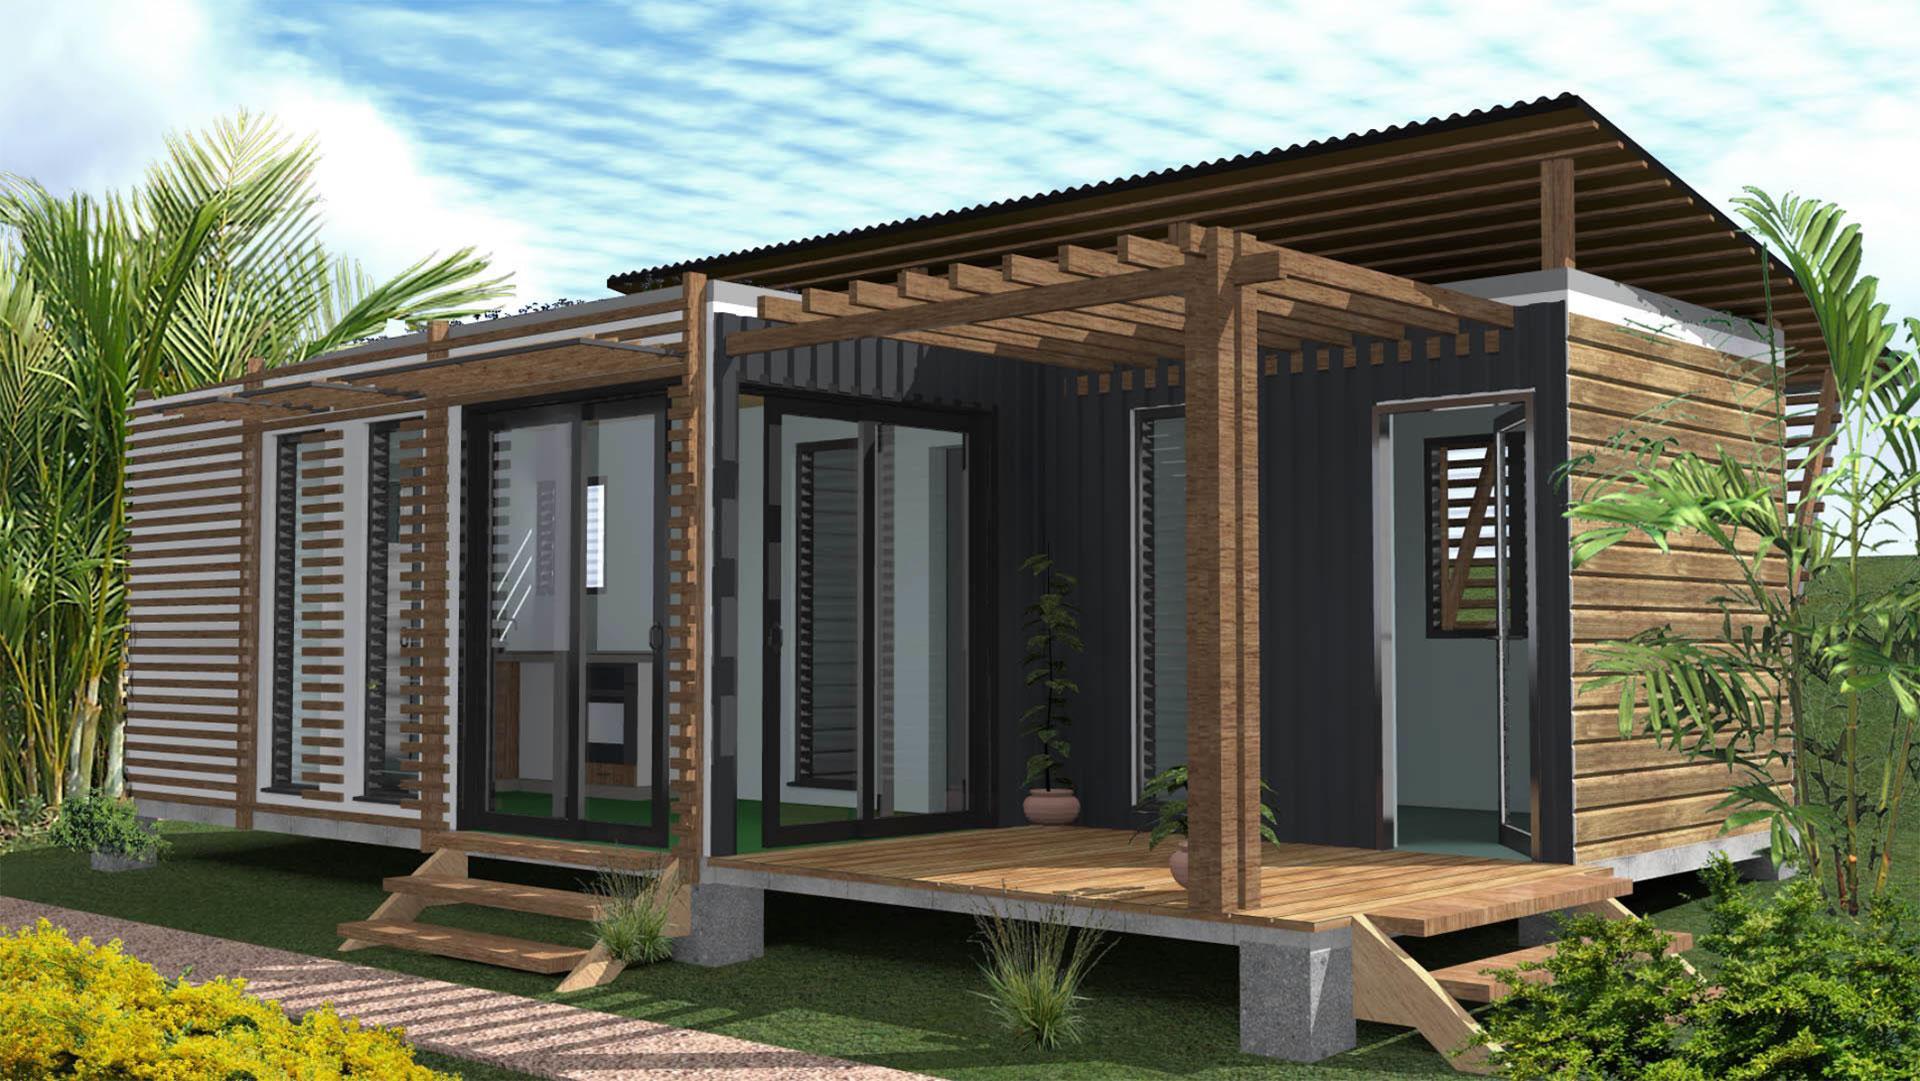 Transformer Container En Maison concernant case container – maison en container à la réunion